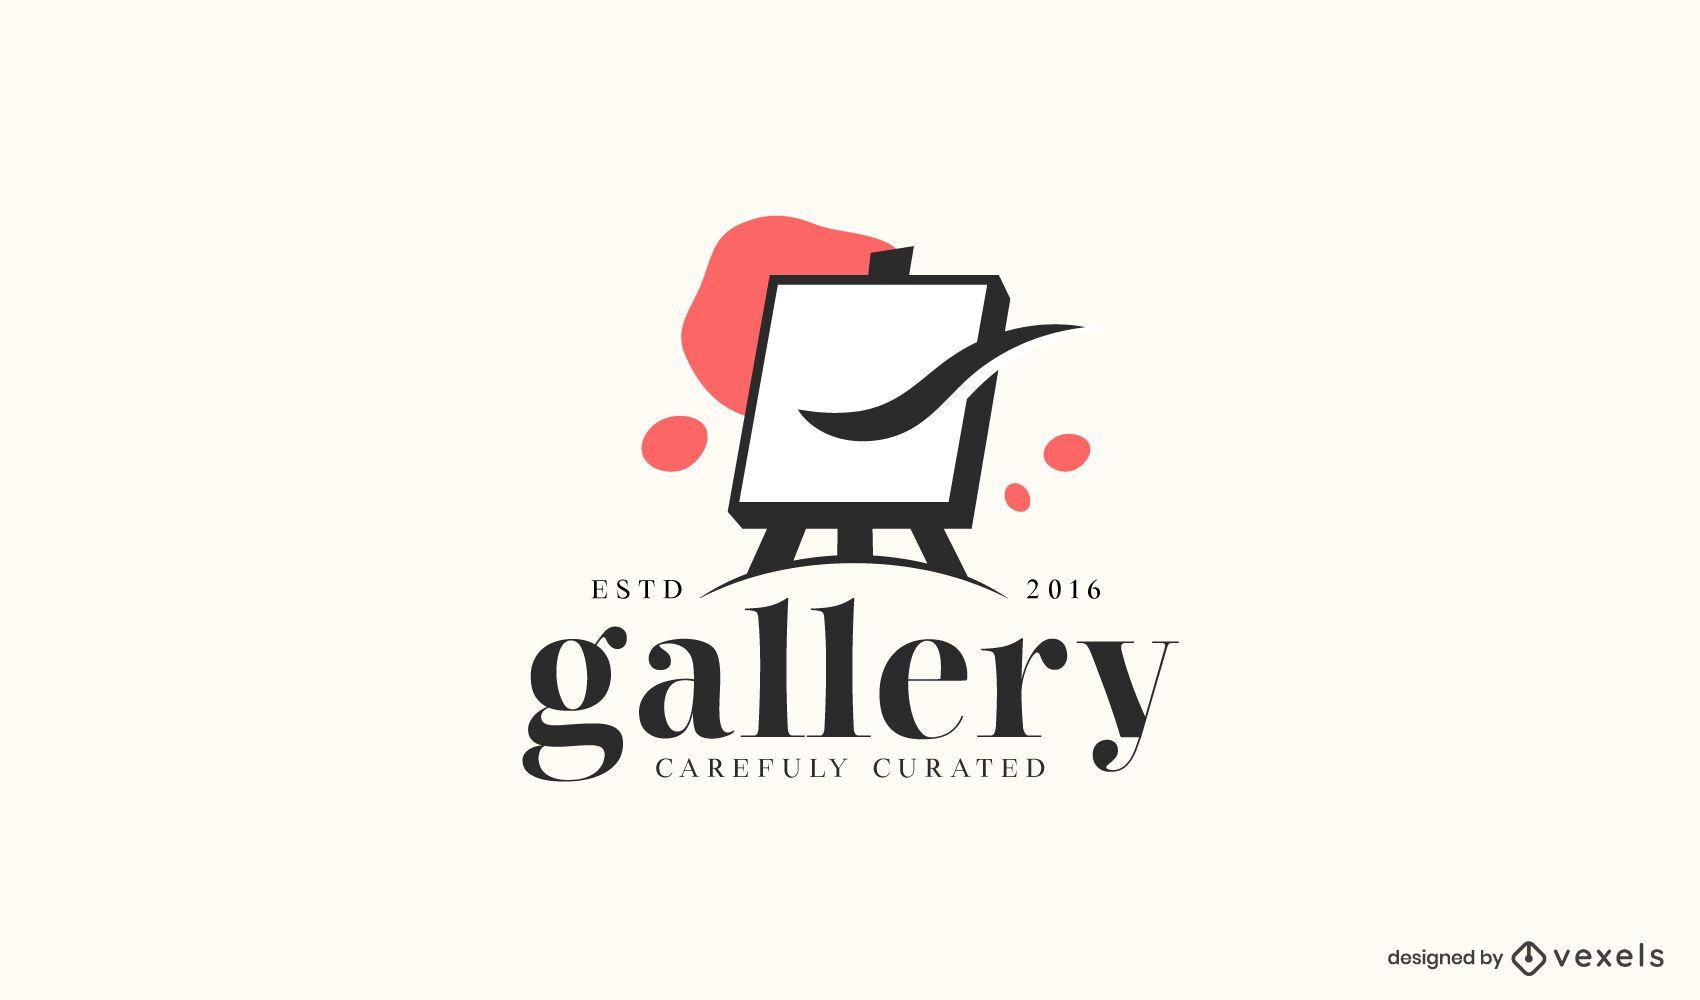 Art gallery business logo